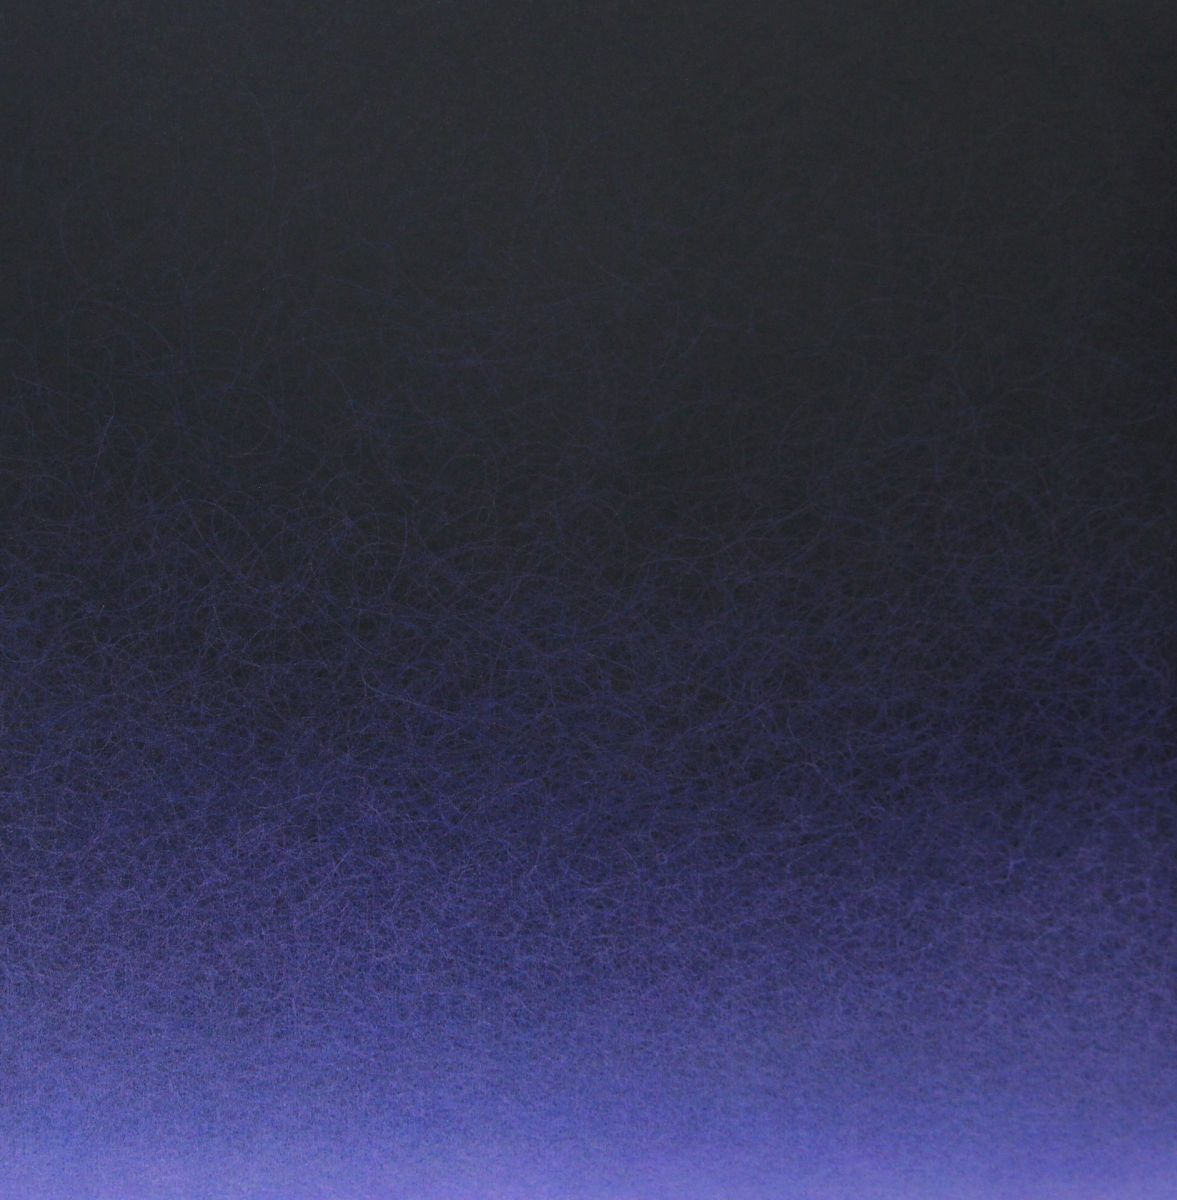 Quantum Entanglement (Violet 1)